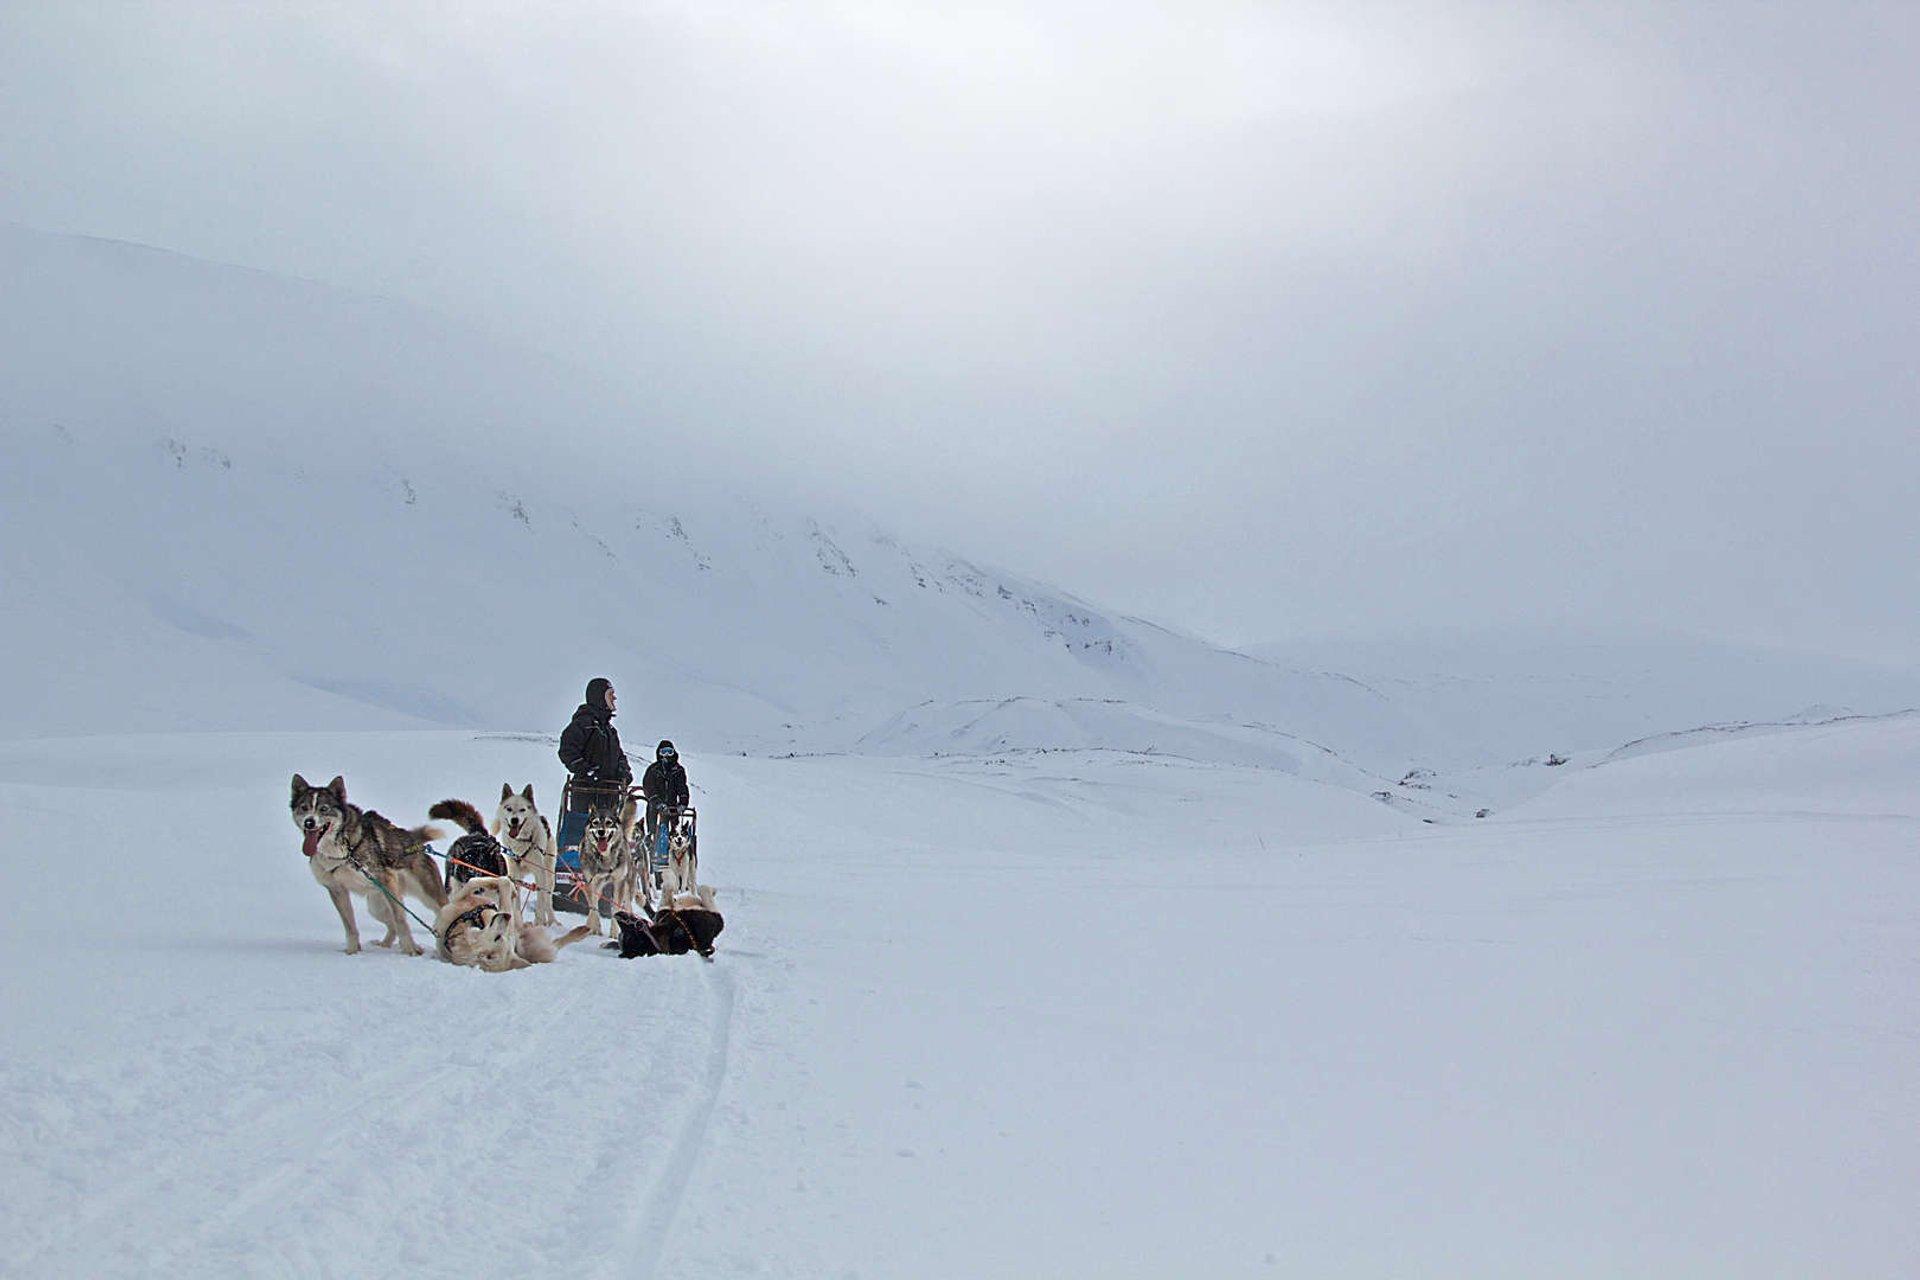 Dog Sledding in Svalbard - Best Season 2020